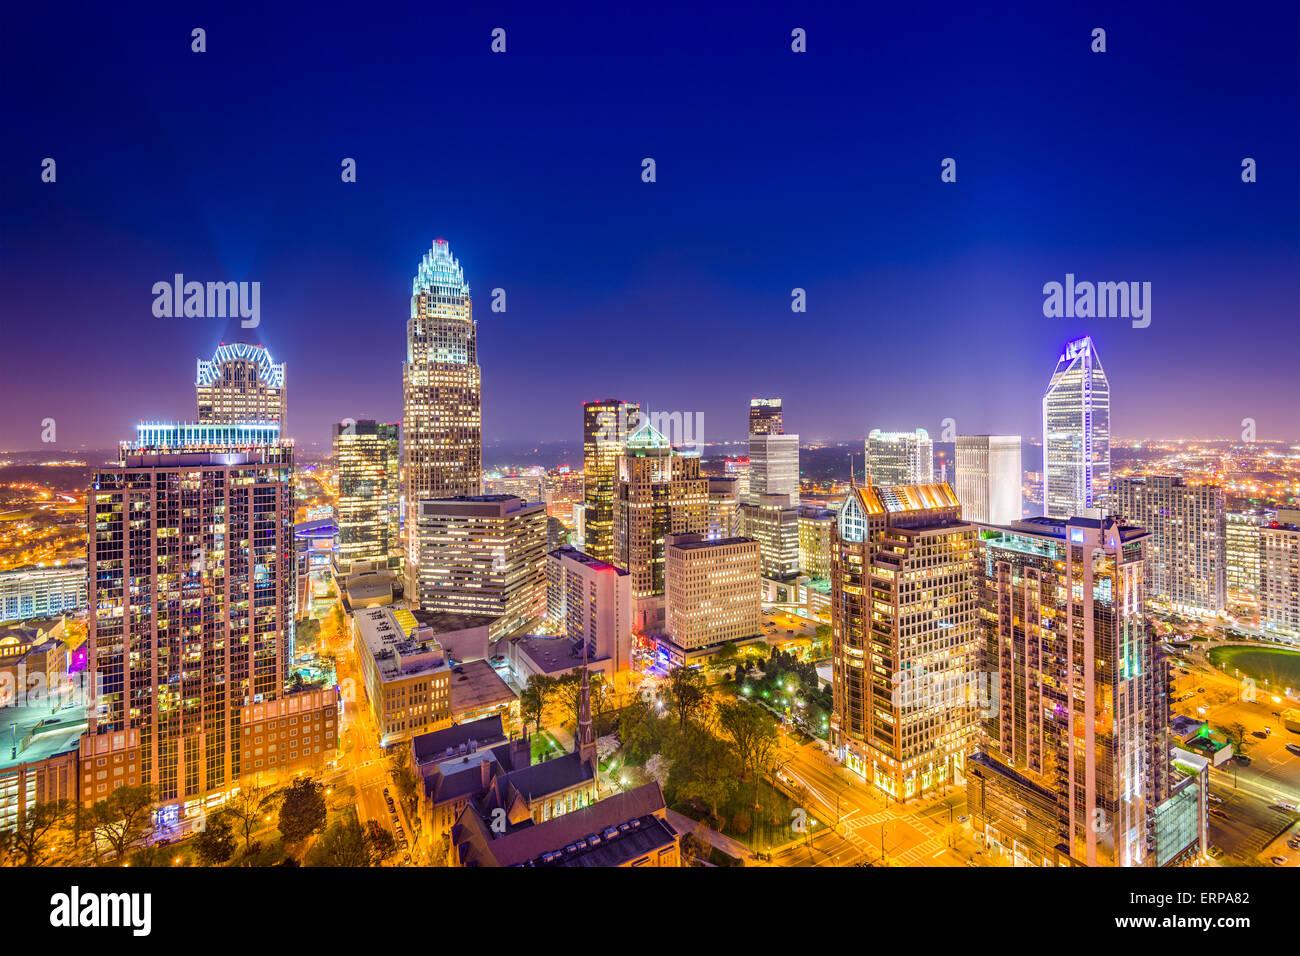 Charlotte, North Carolina, USA uptown skyline at night. - Stock Image